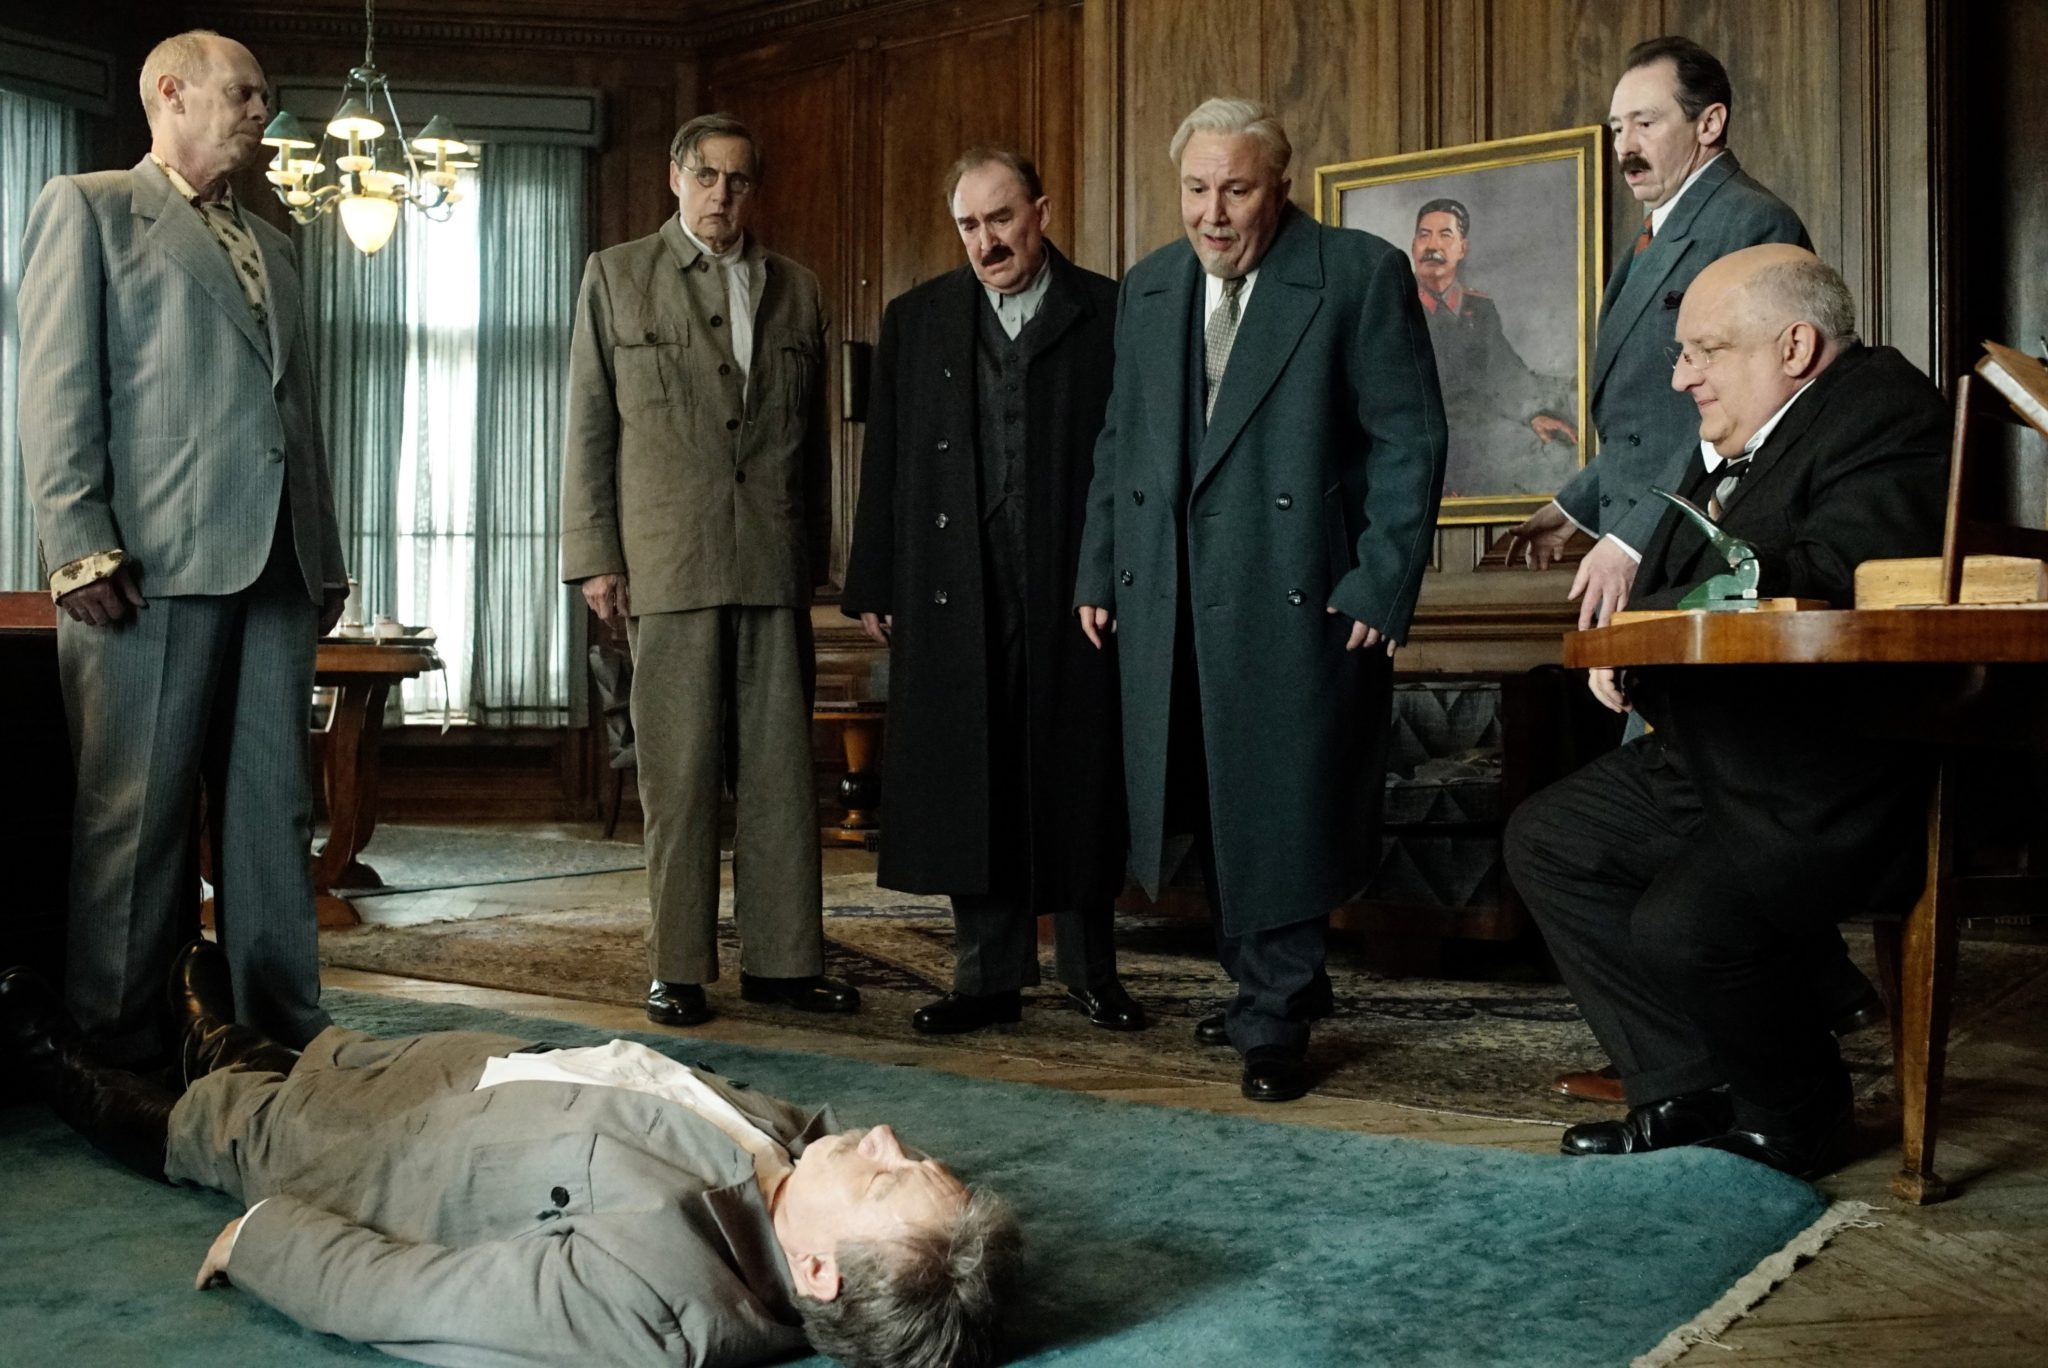 La Mort de Staline d'Armando Iannucci image 1